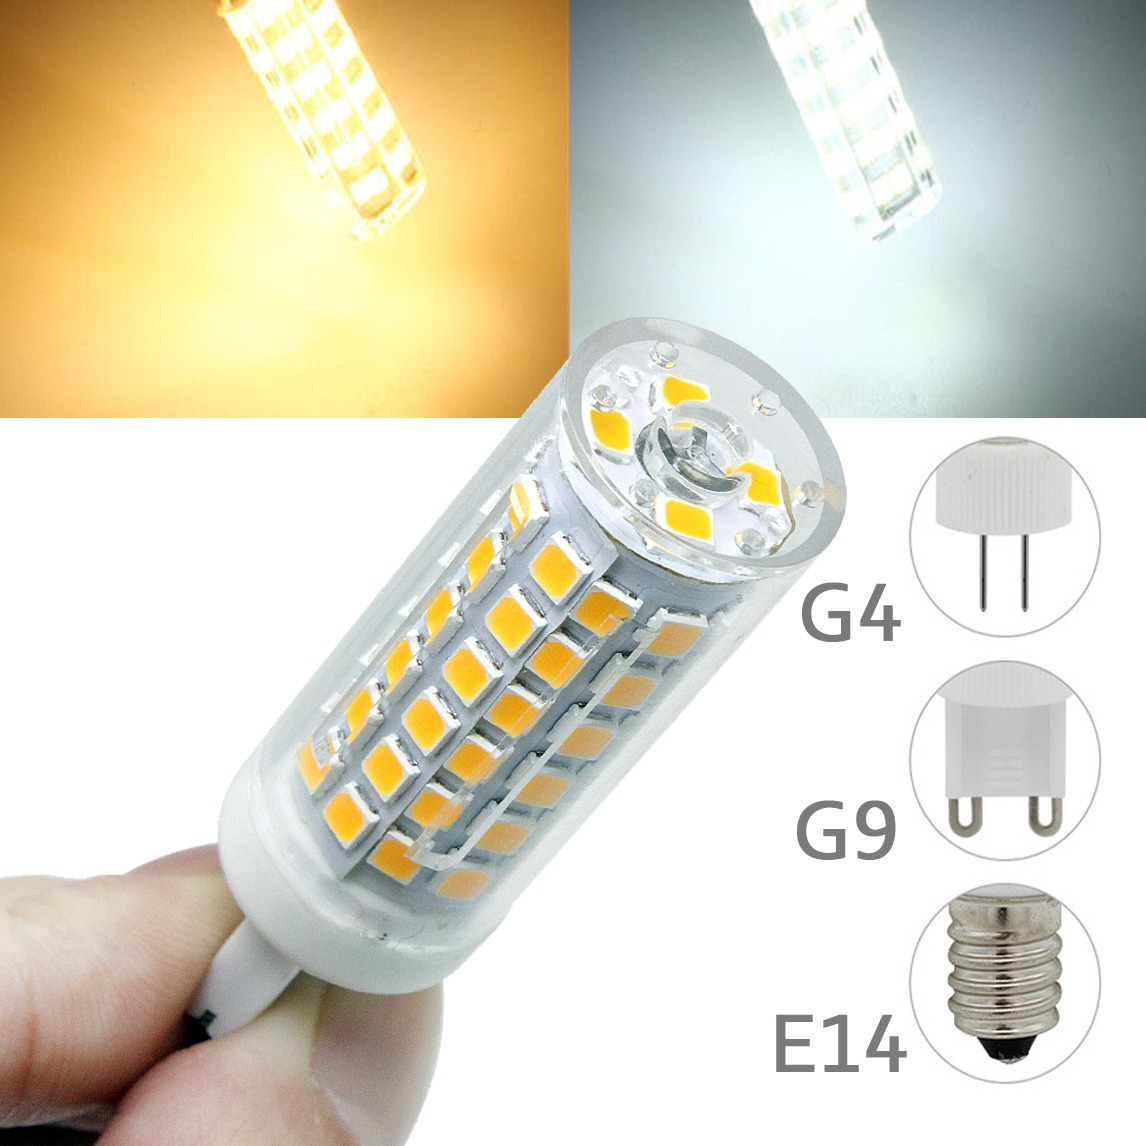 Lampada Led E14 Para Lustre.Kit 10 Lampadas Led Halopin G9 G4 E14 7w Lustres Pendentes